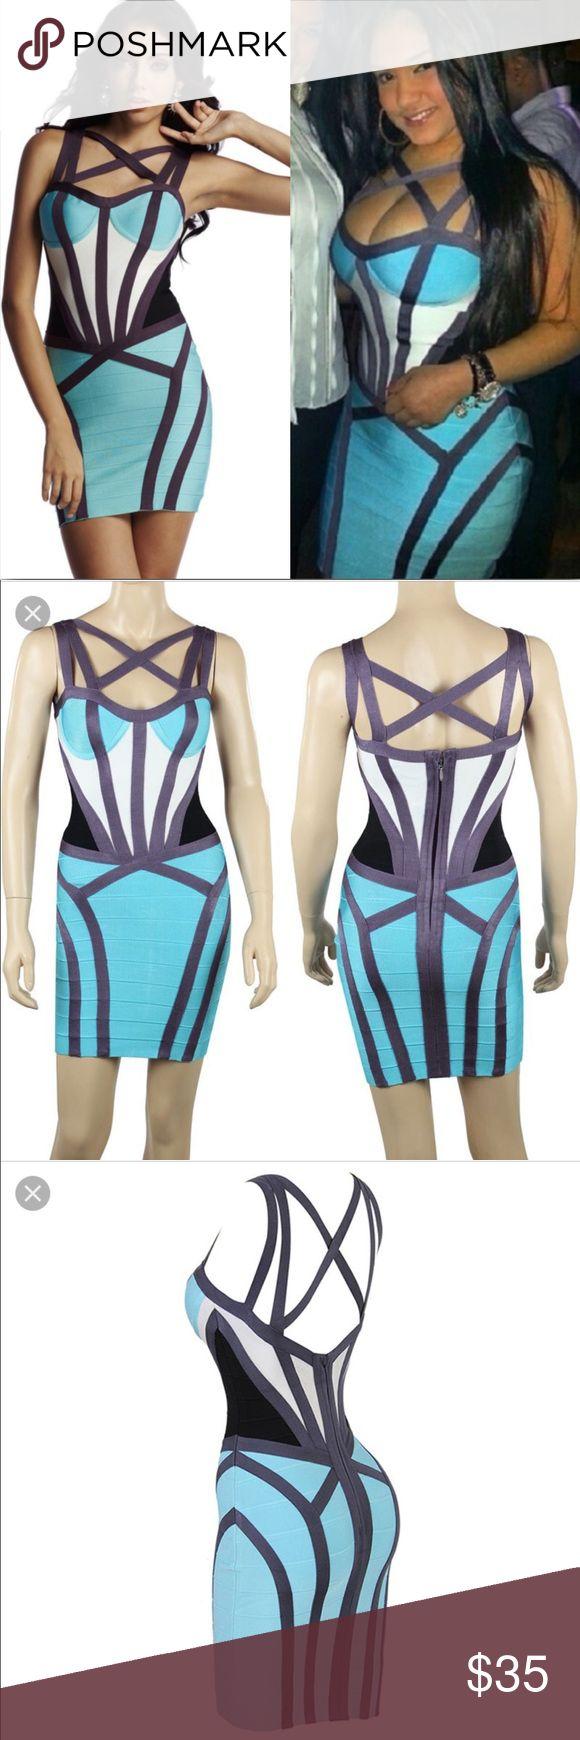 Bandage blue and purple cross cross dress Brand new Body contouring dress... high quality bandage material. Dresses